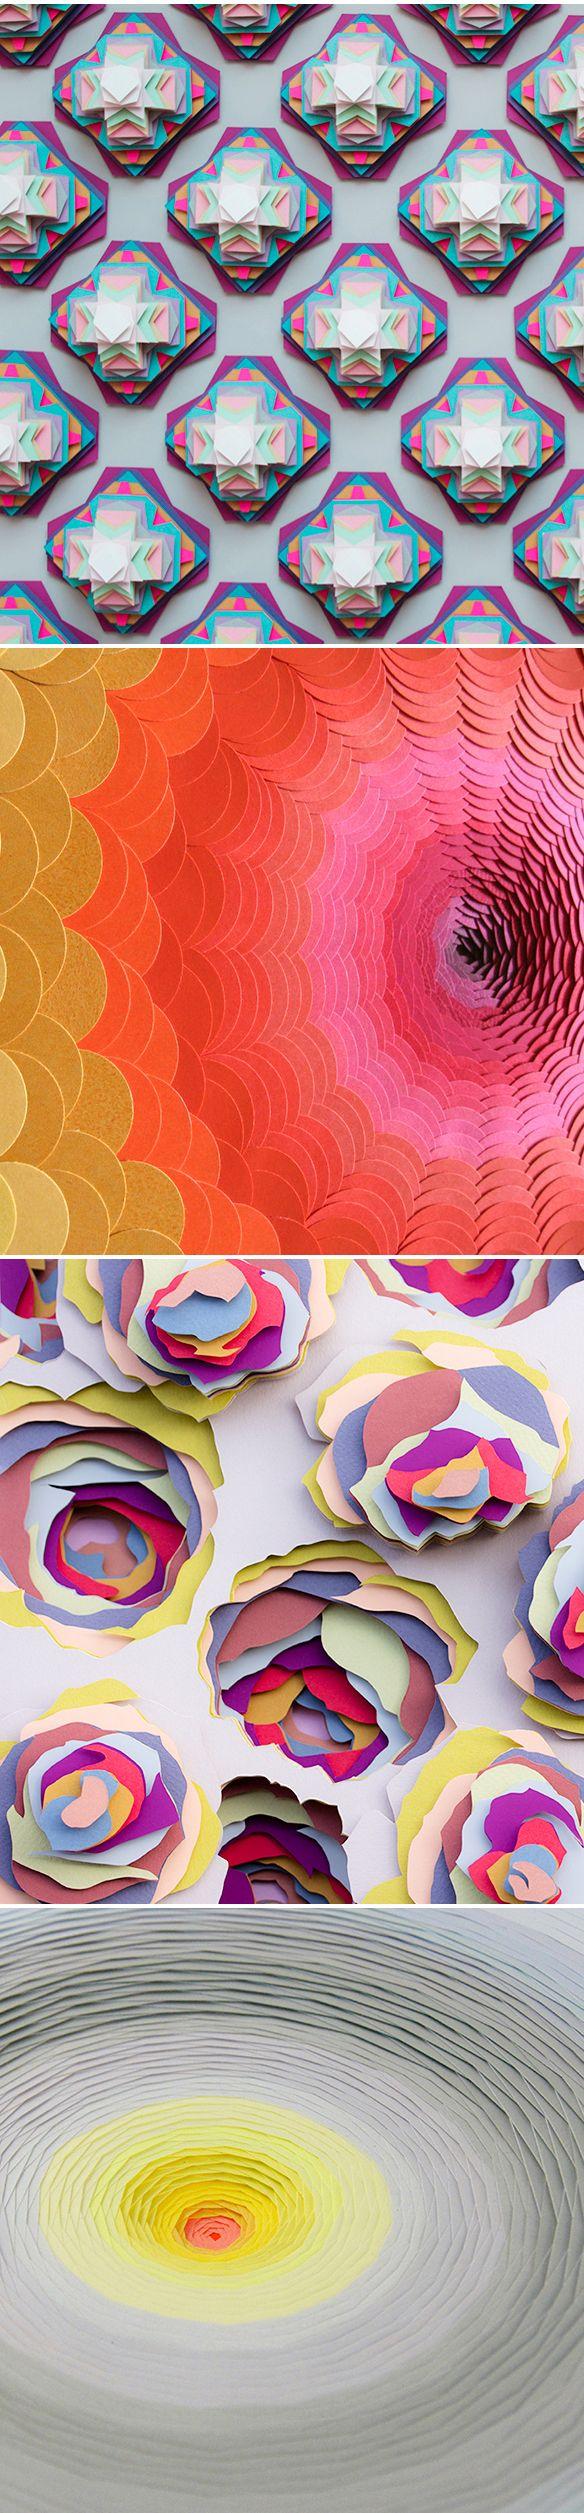 maud vantours - paper sculpture <3